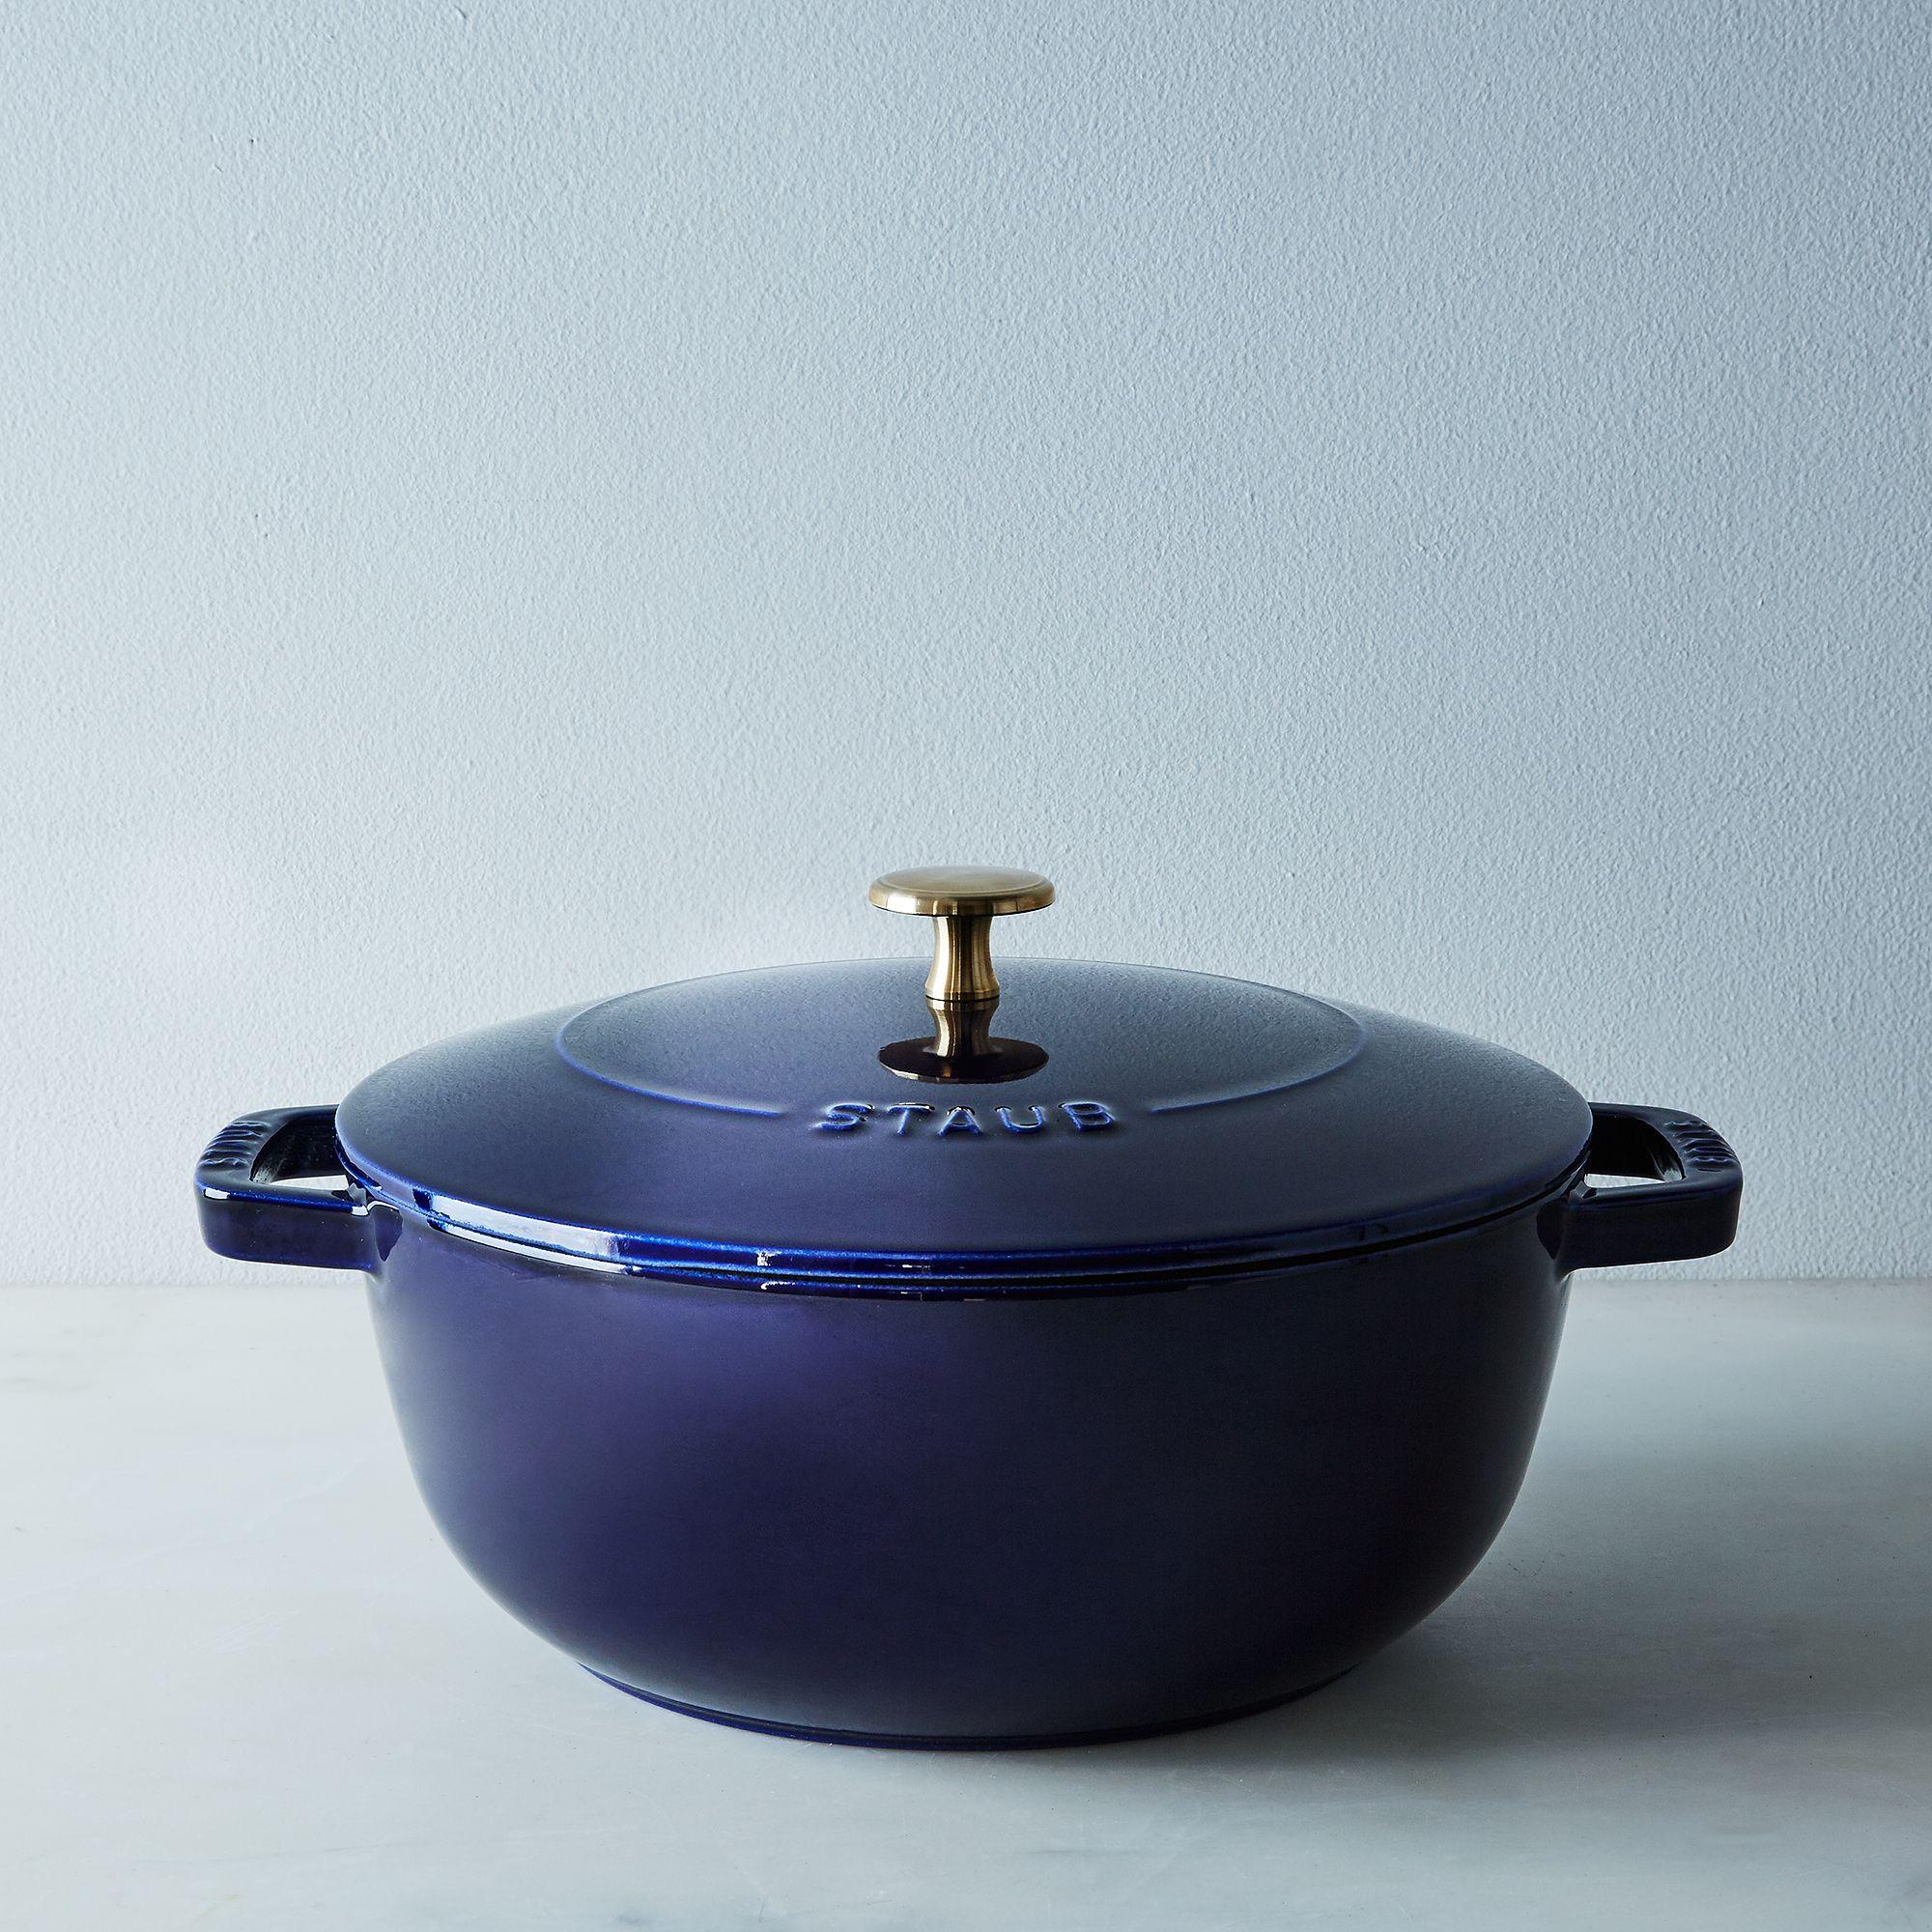 A9dcd761 9800 4b4d 9e75 91aaf2c9fd5e  2016 0726 zwilling staub essentlal french oven 3.75 qt blue silo bobbi lin 1037